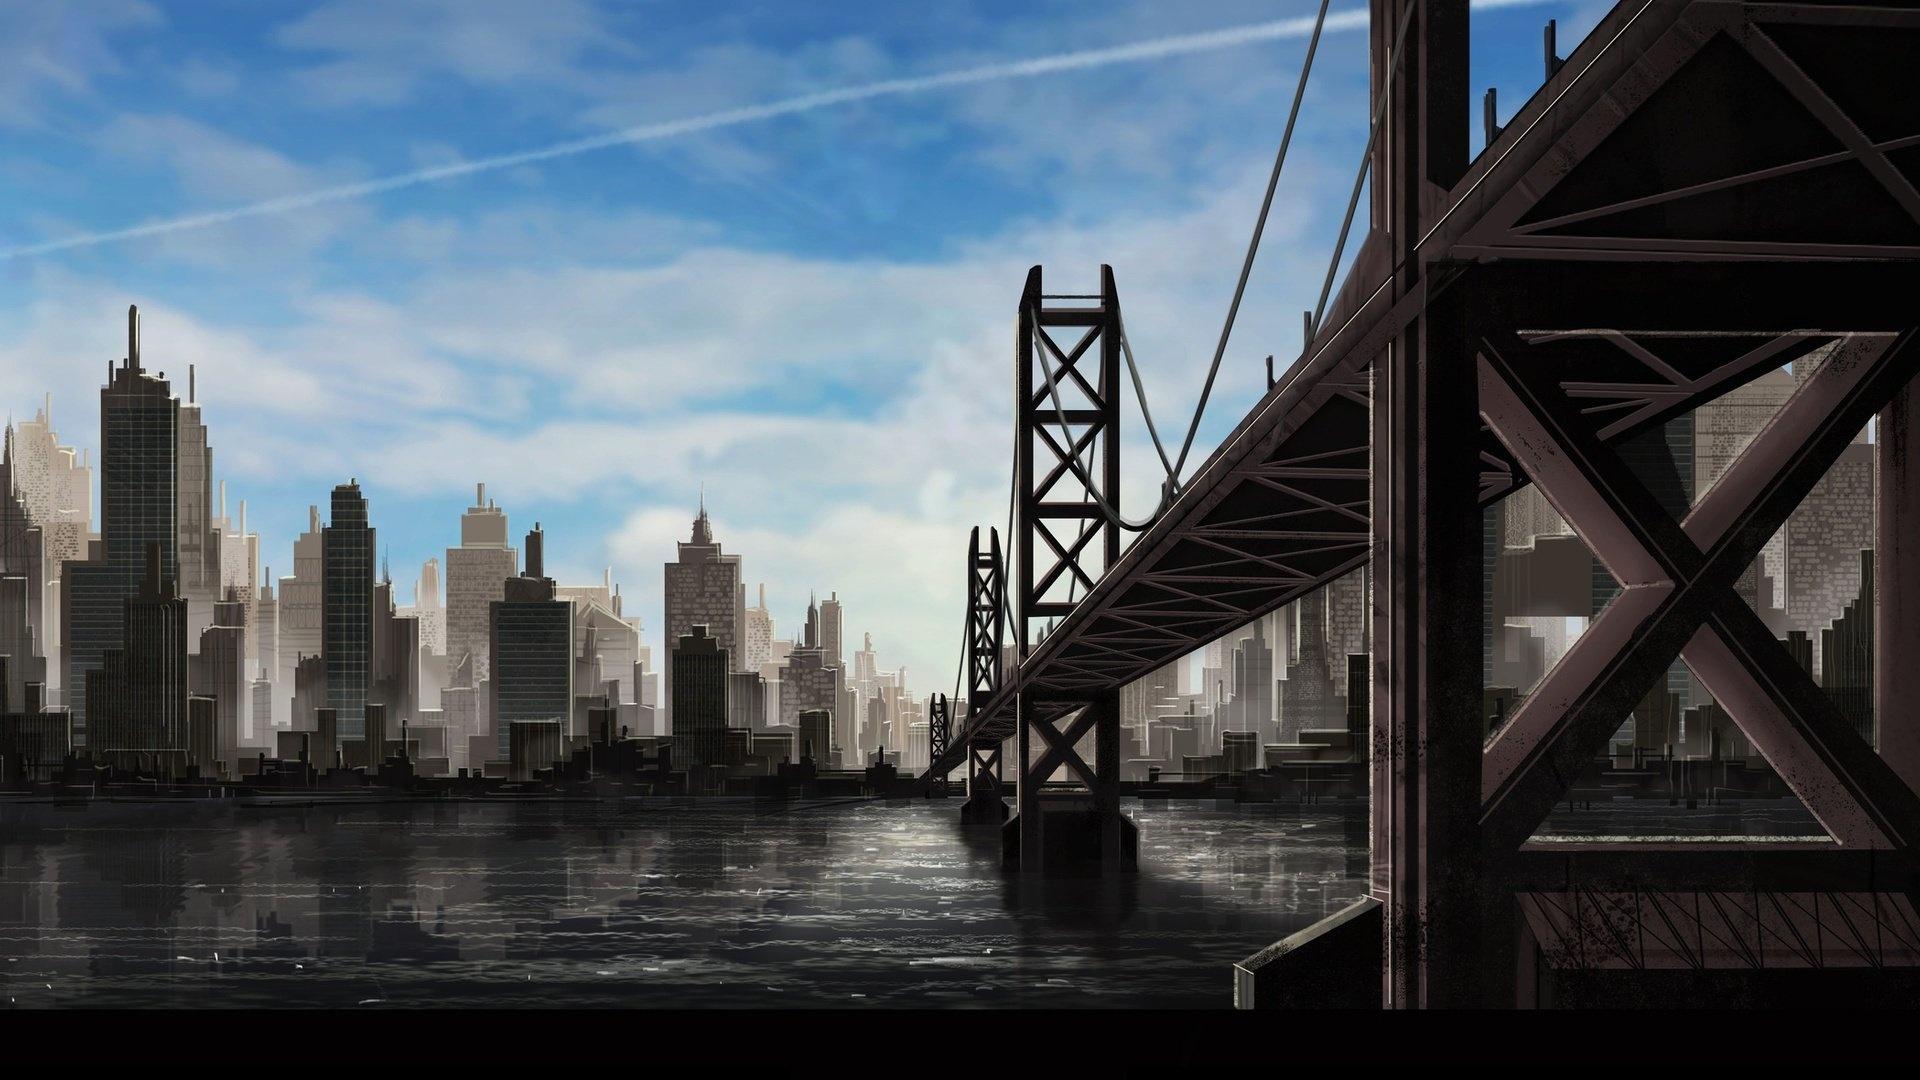 Bridge Art wallpaper for desktop